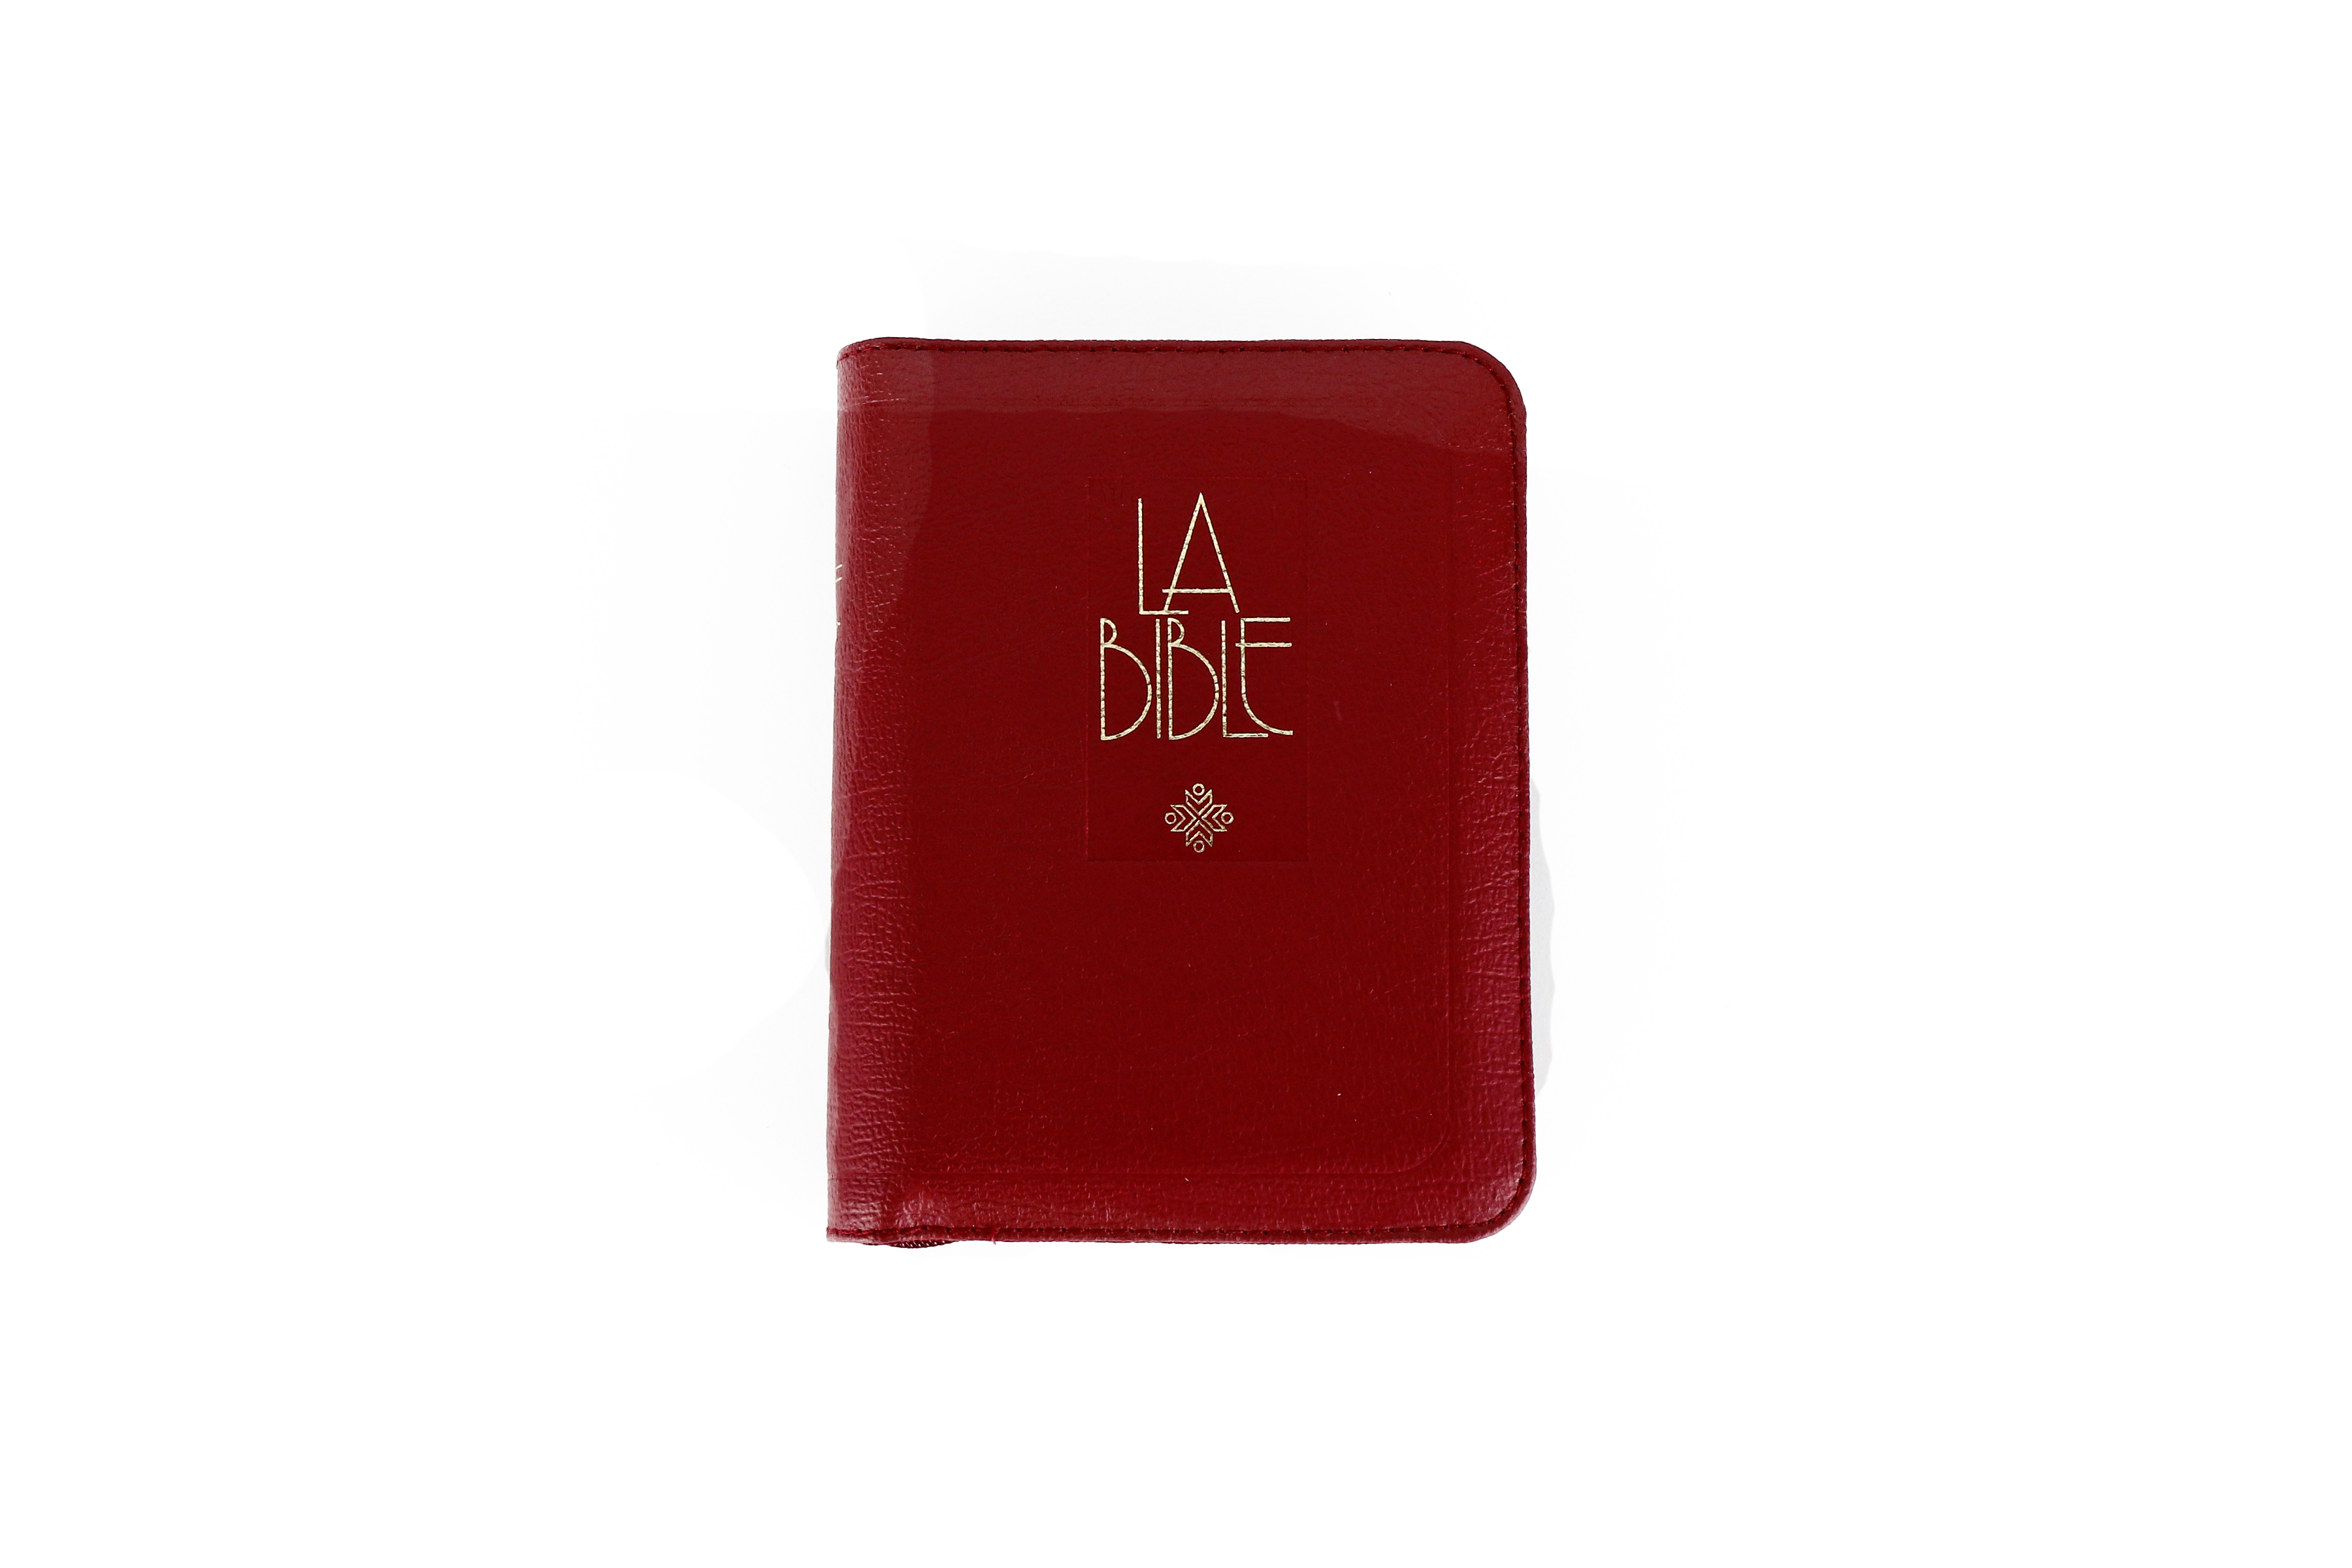 La Bible format moyen / Bible in French